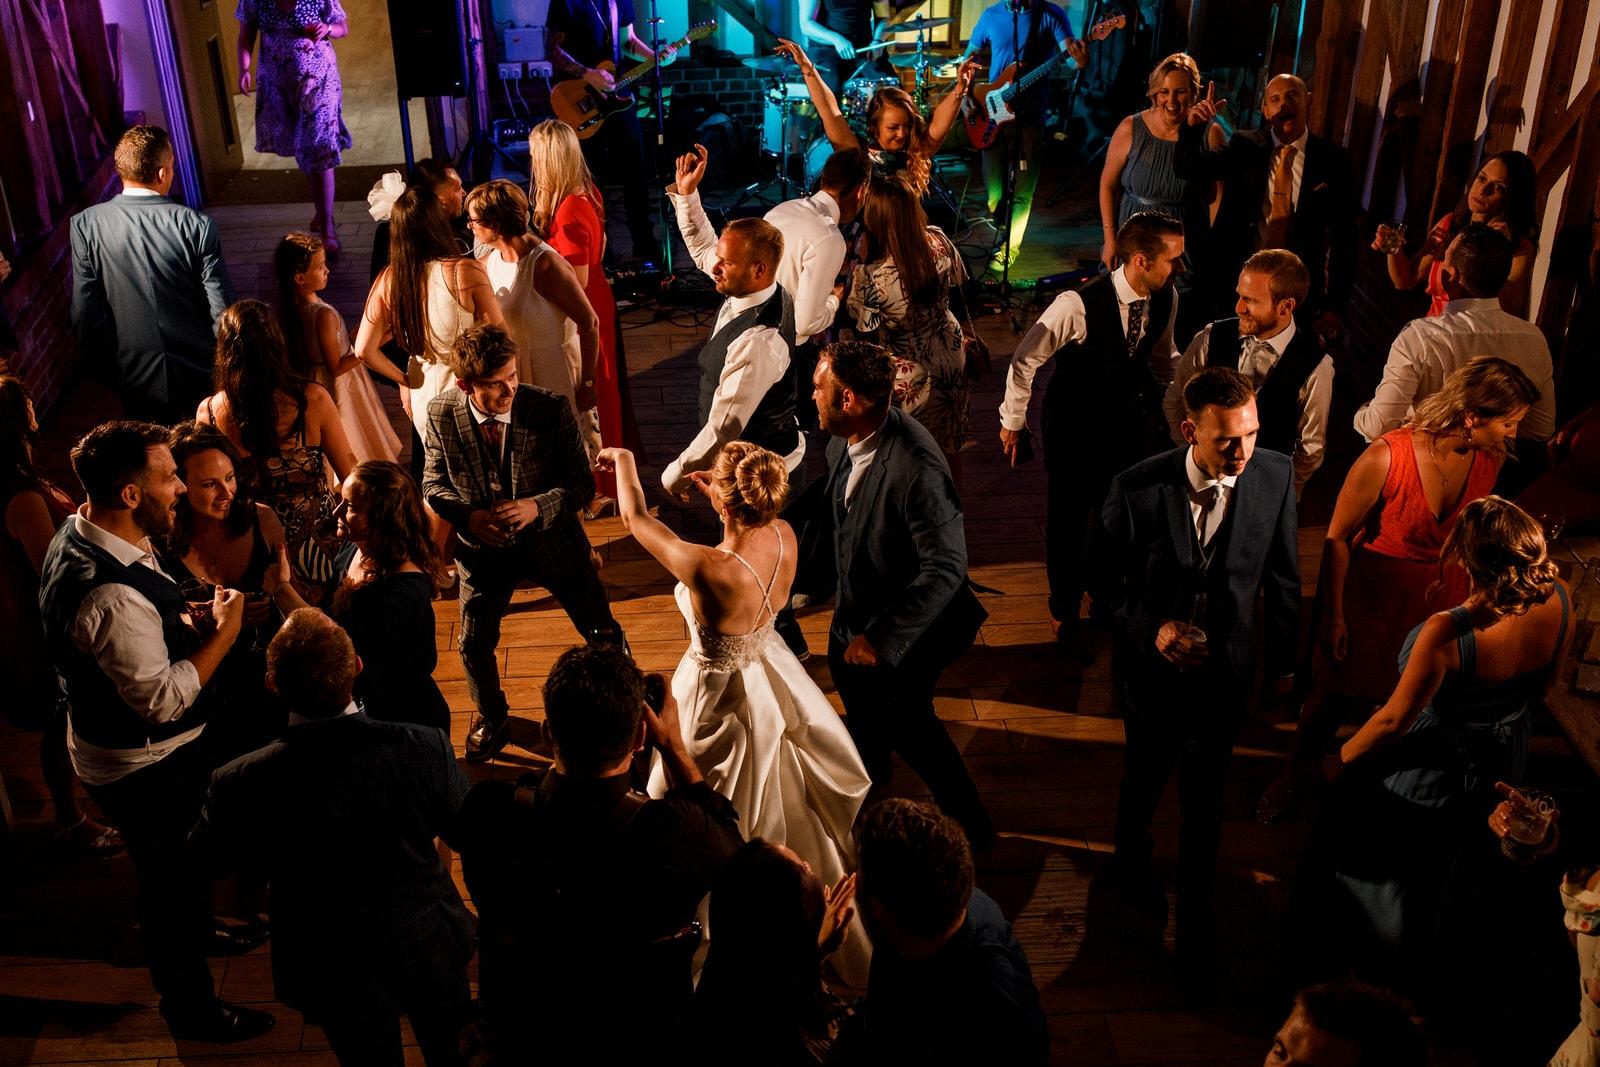 dancing at milling barn wedding